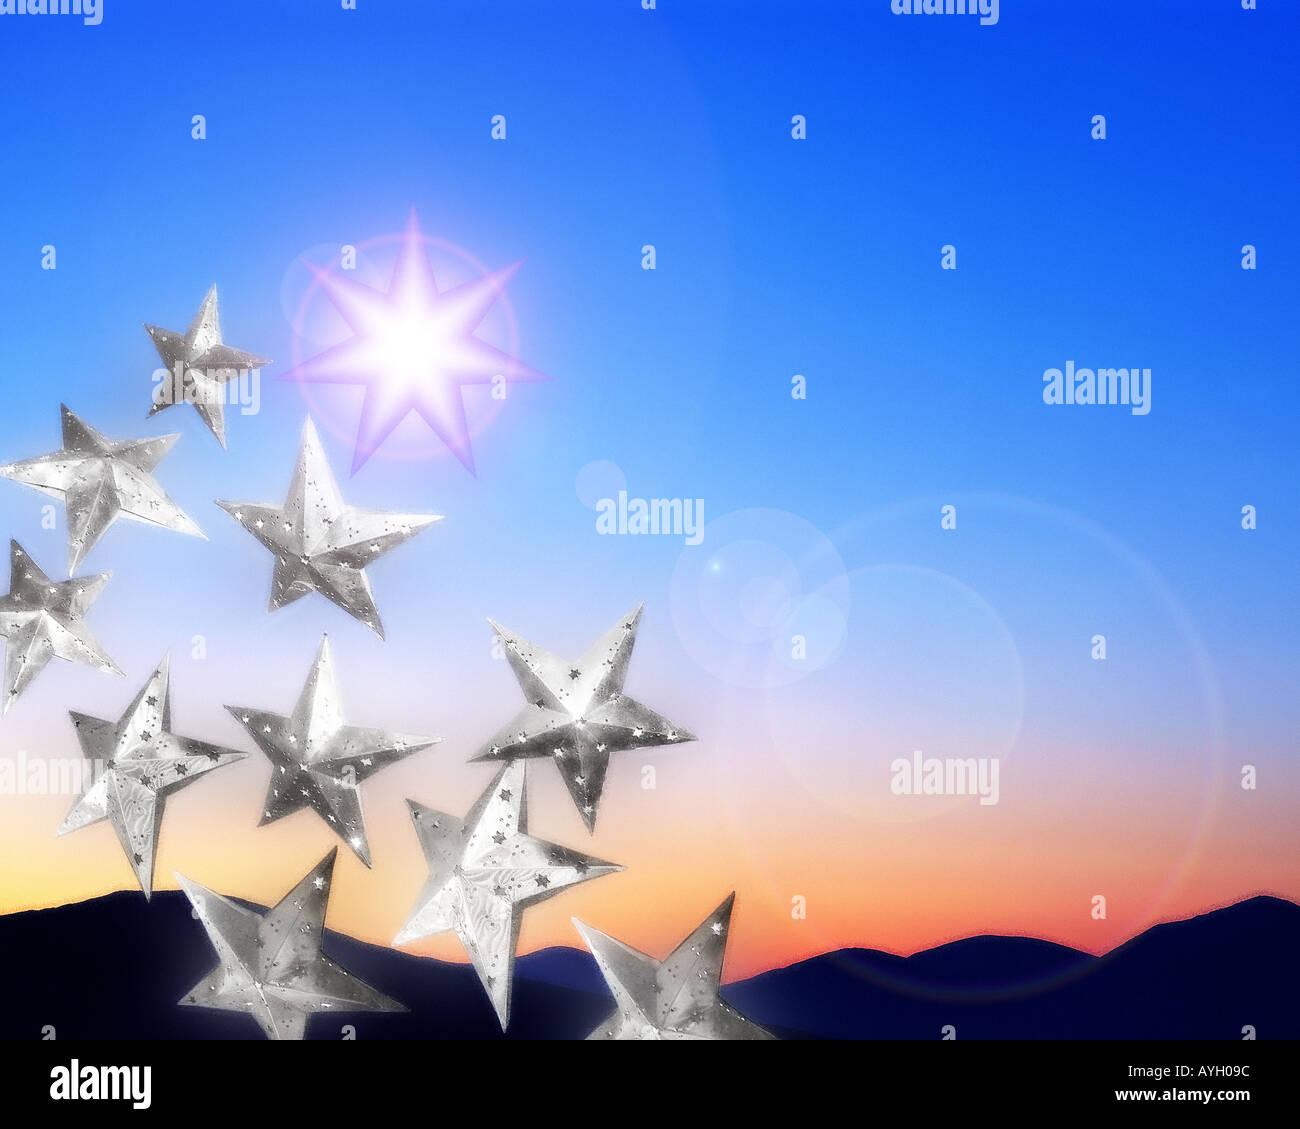 DIGITALE Kunst: Weihnachtsmotiv Stockbild